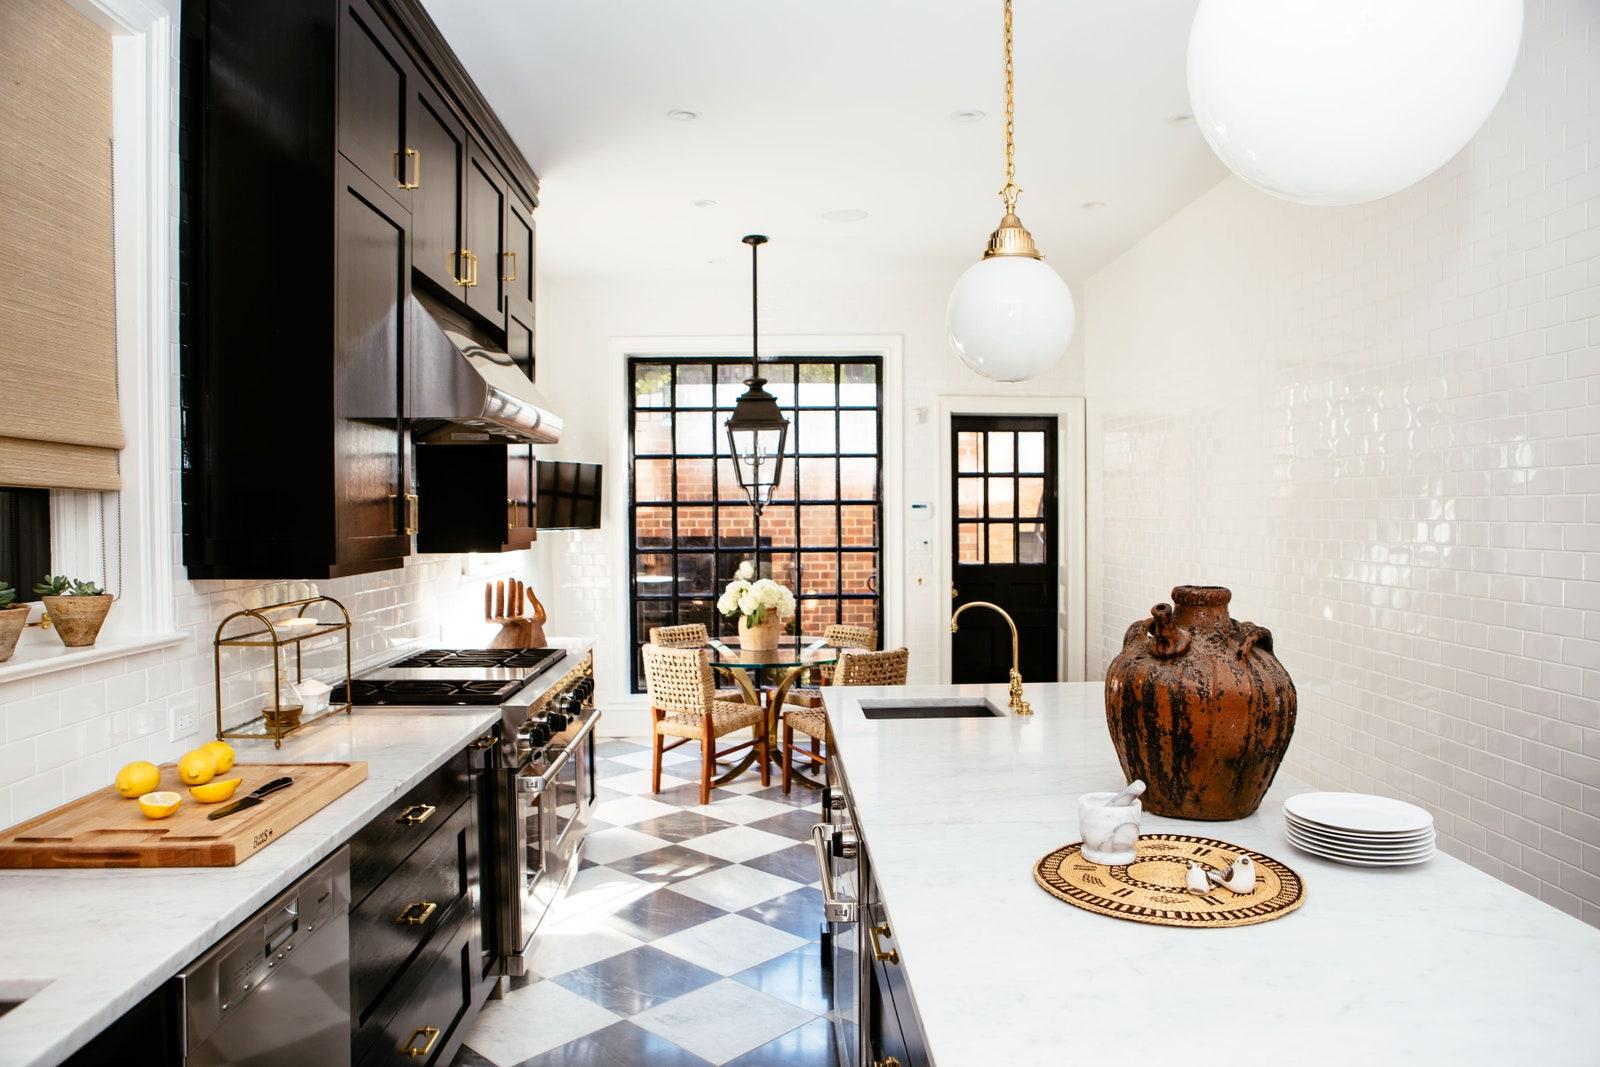 Décor Inspiration | At Home With: Lauren Buxbaum Gordon, Chicago